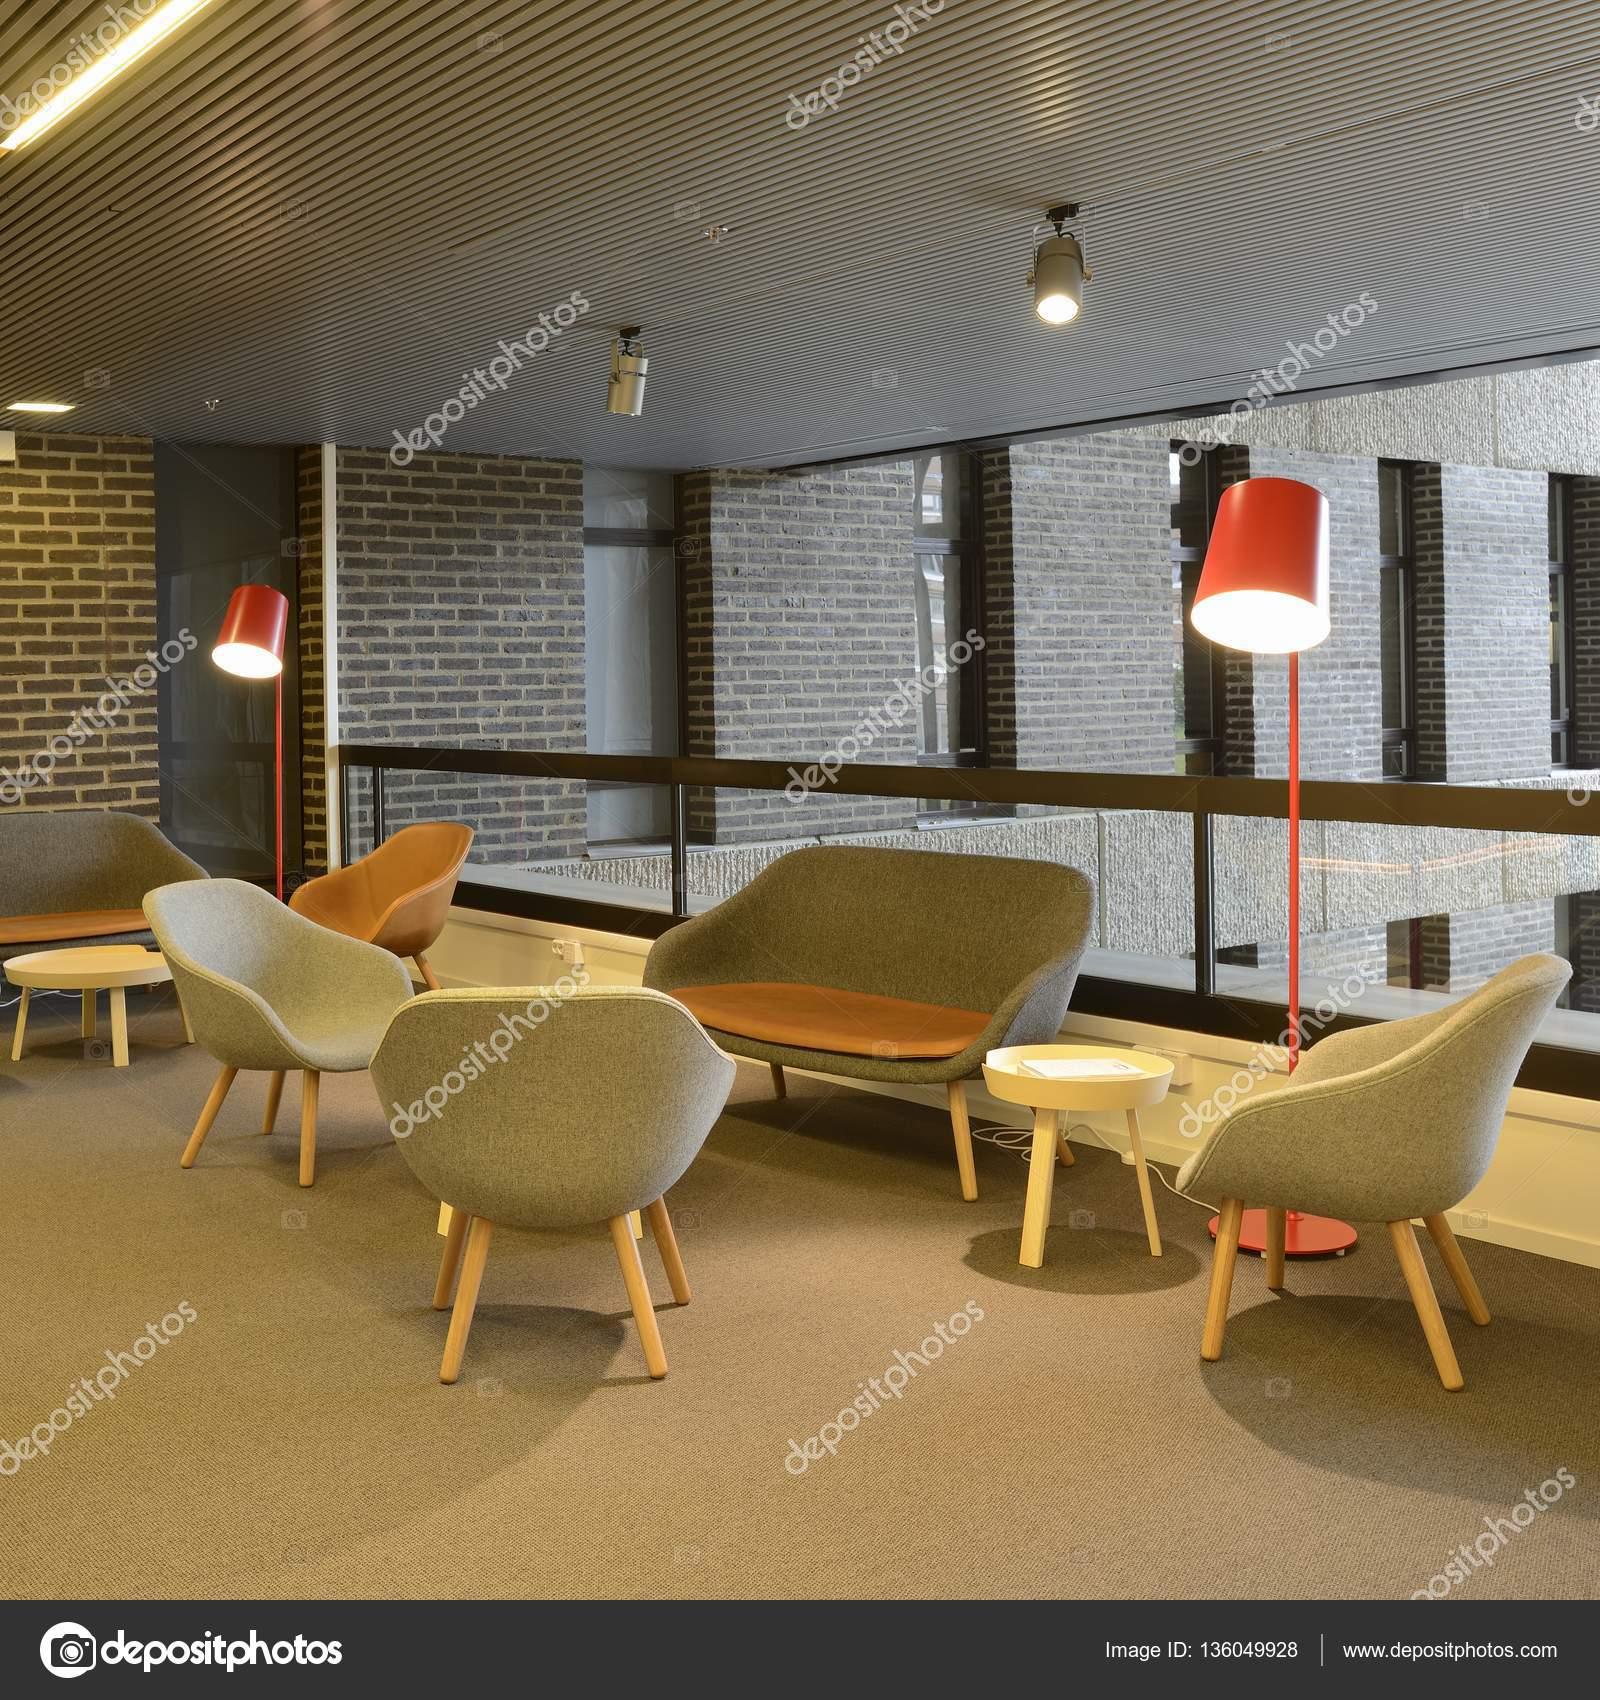 Lege cafetaria interieur — Stockfoto © a40757 #136049928